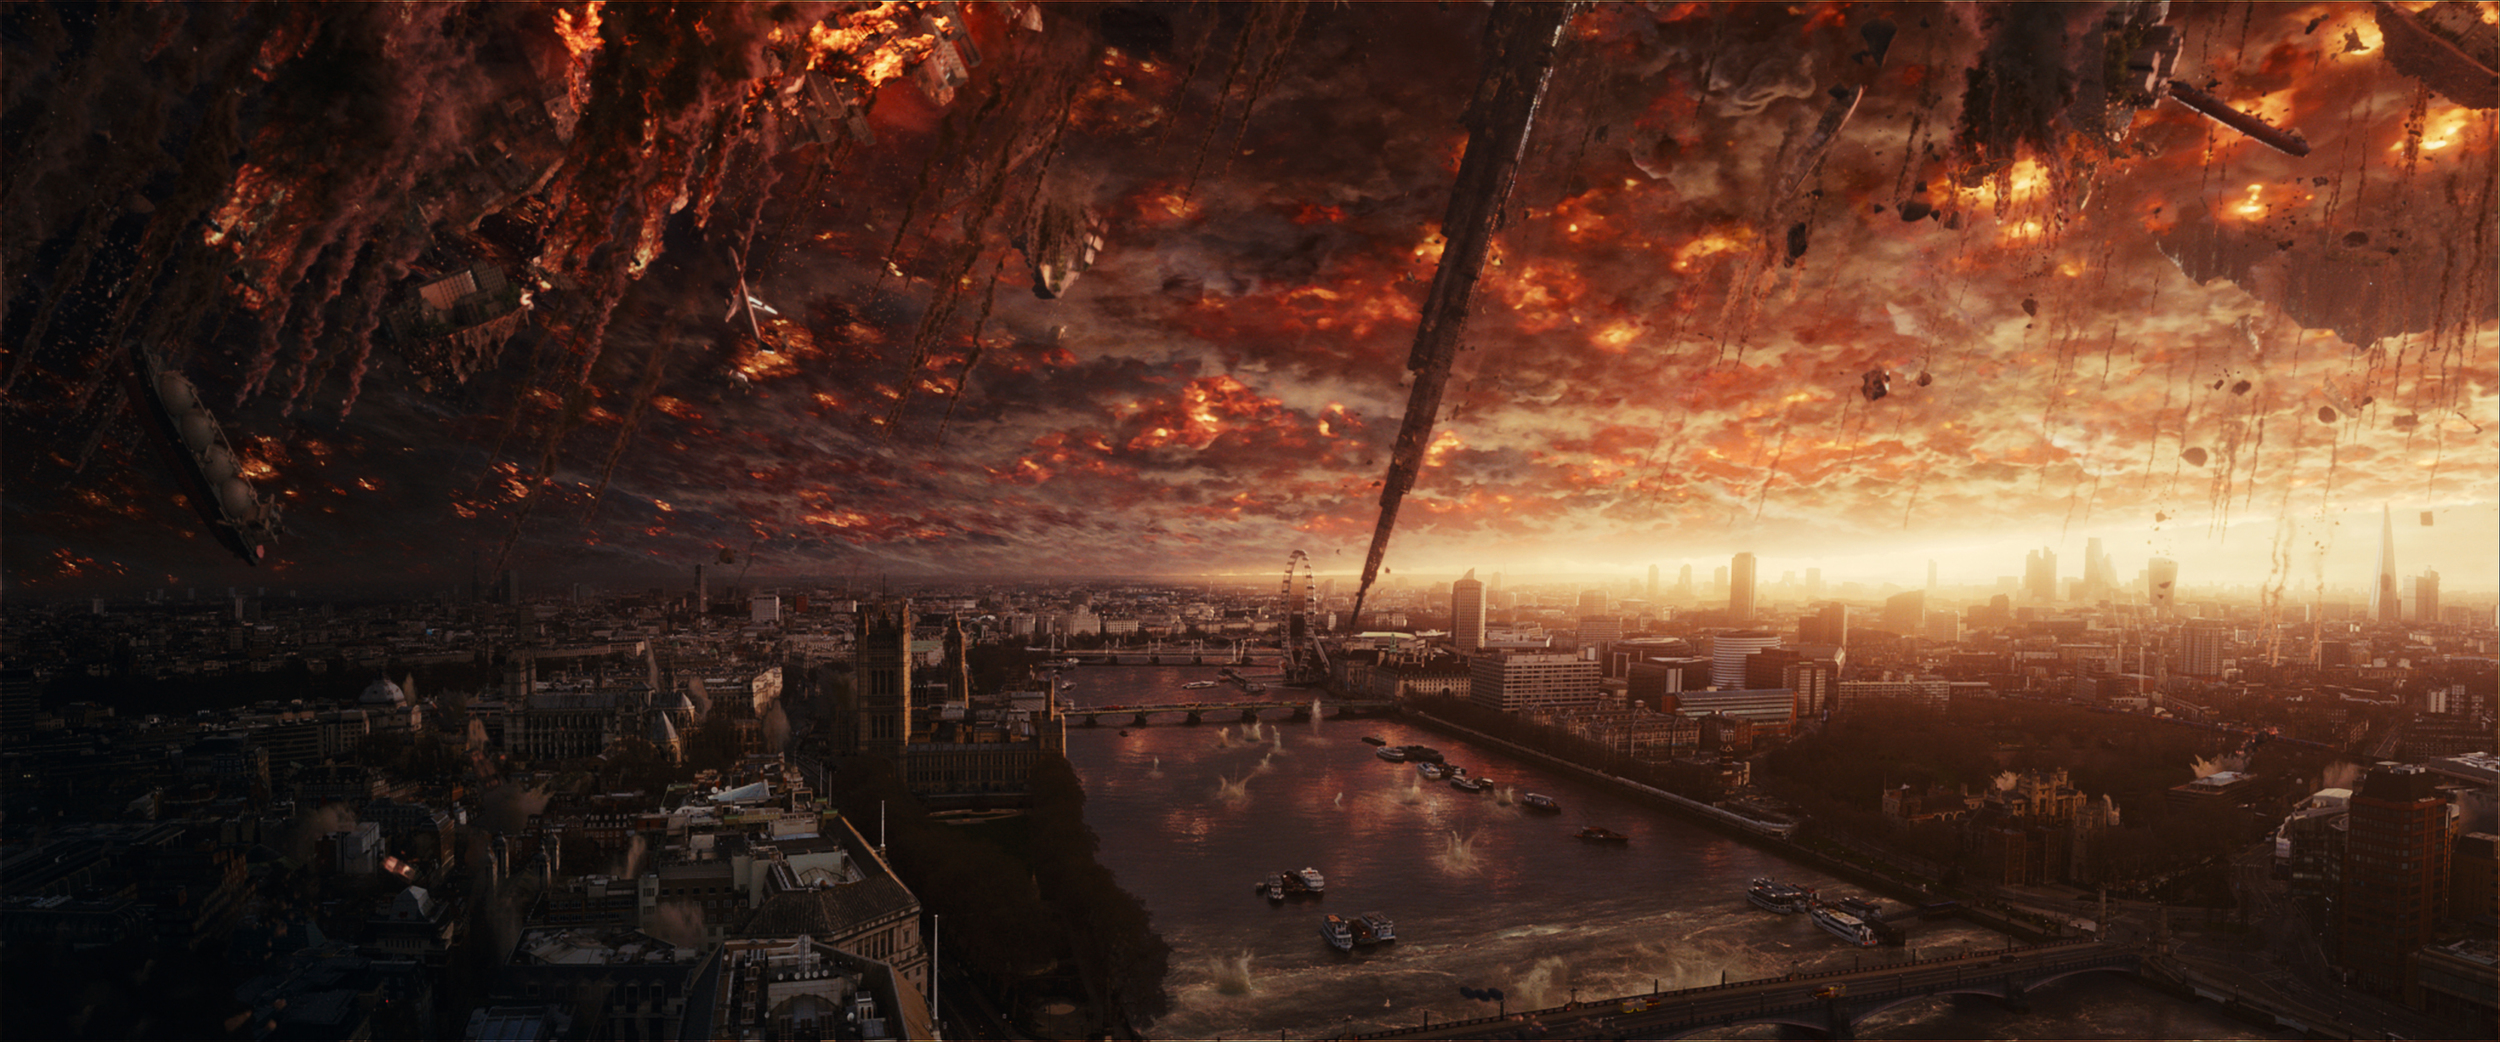 (Image courtesy of Twentieth Century Fox Film Corporation via EPK.tv)